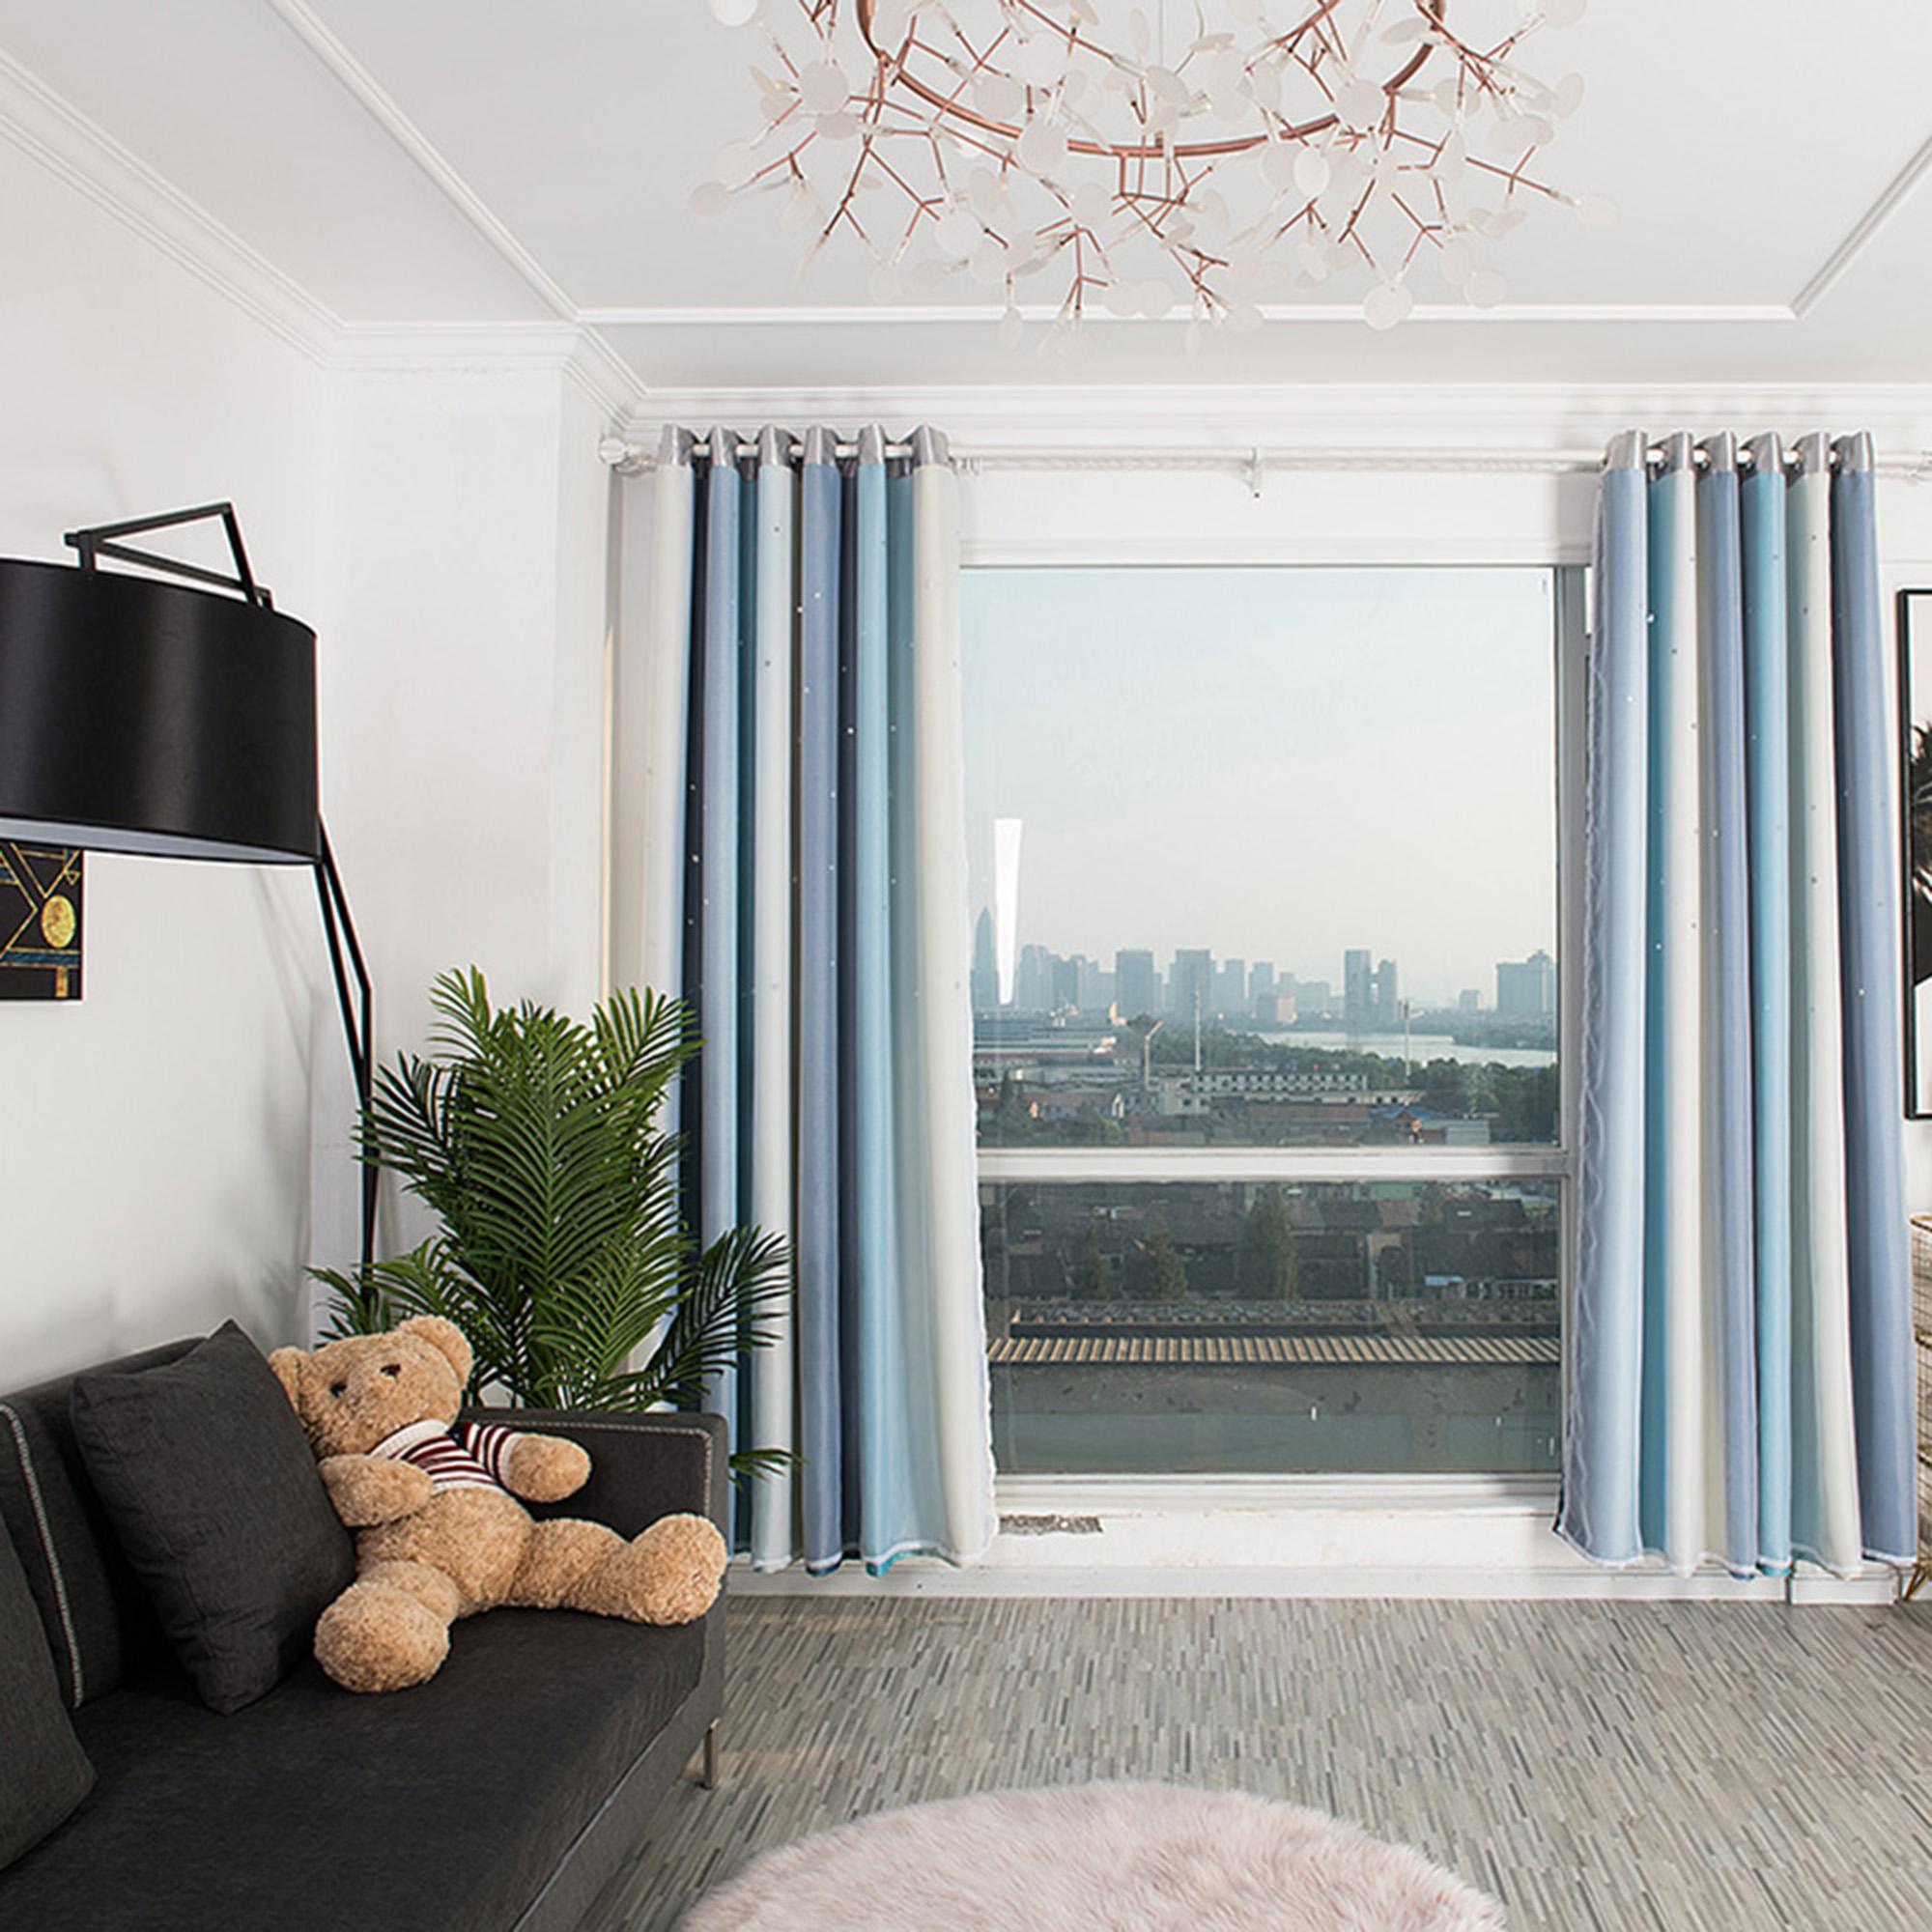 2 couches etoiles tulle rideaux occultants chambre degrade assombrissement starry girls chambre d enfants